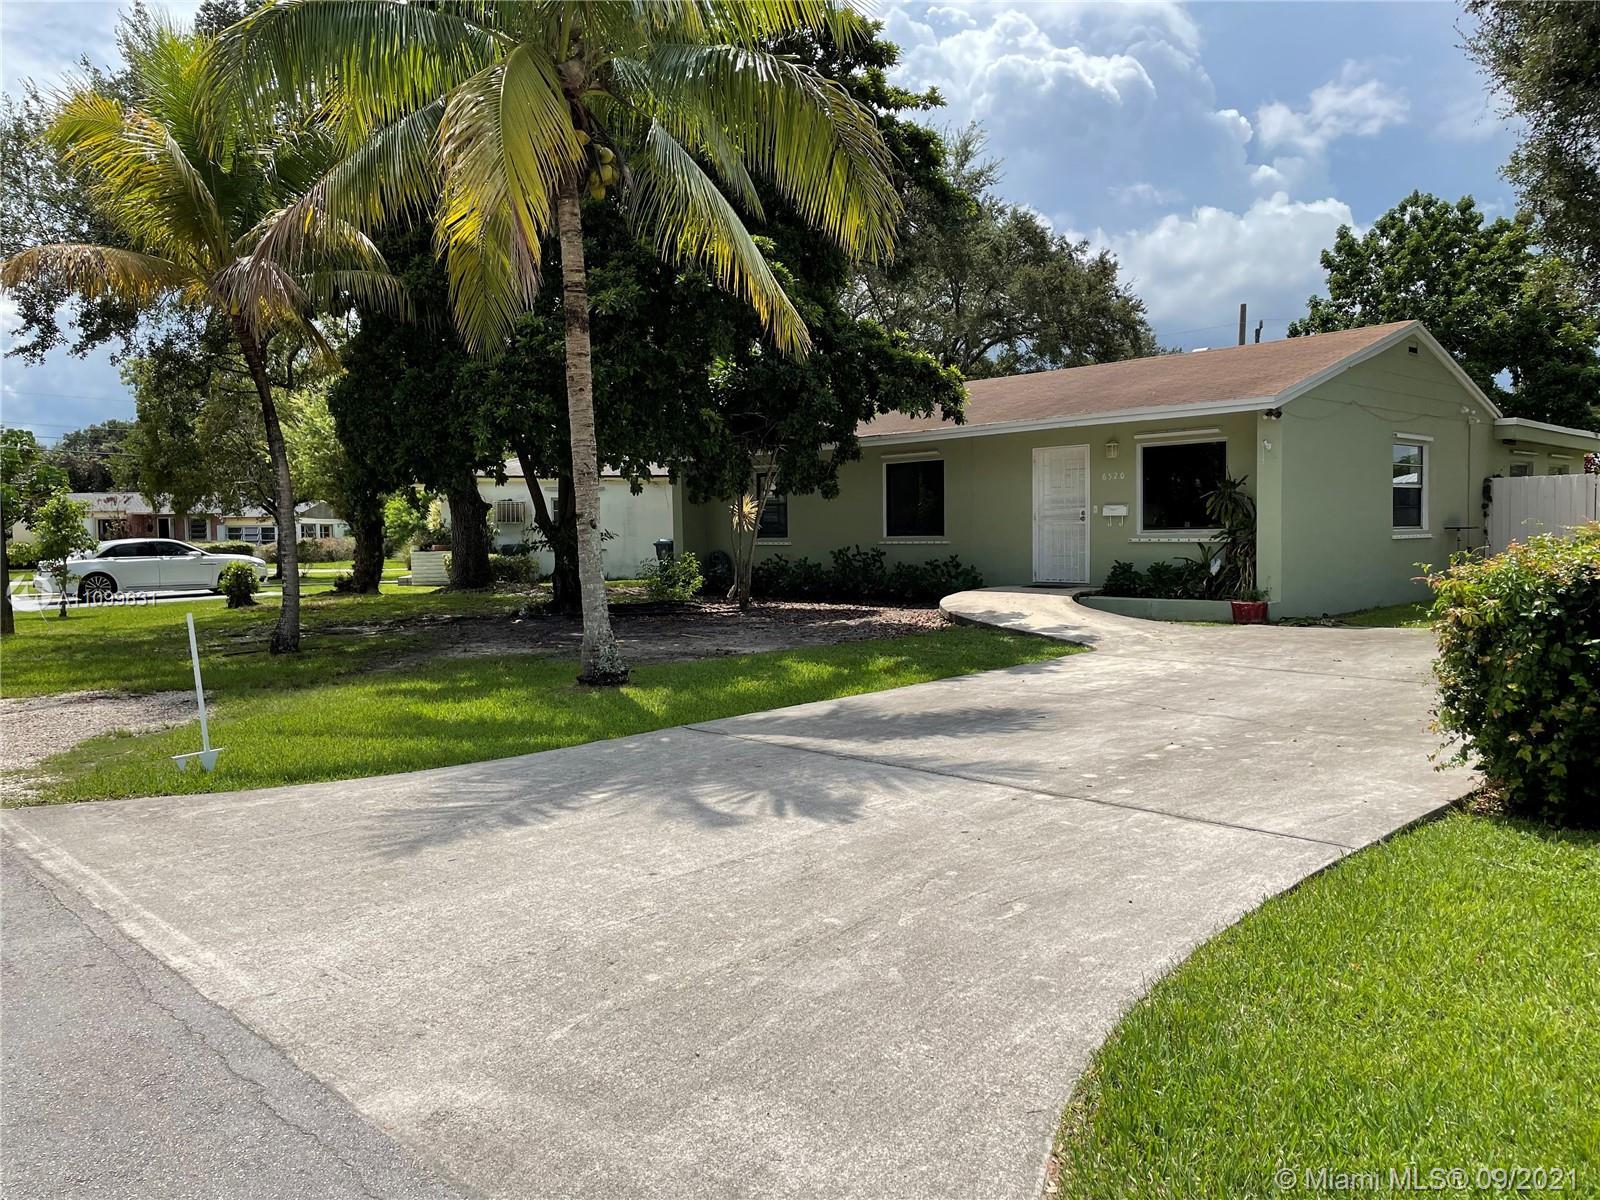 6520 64th Ave, South Miami, Florida 33143